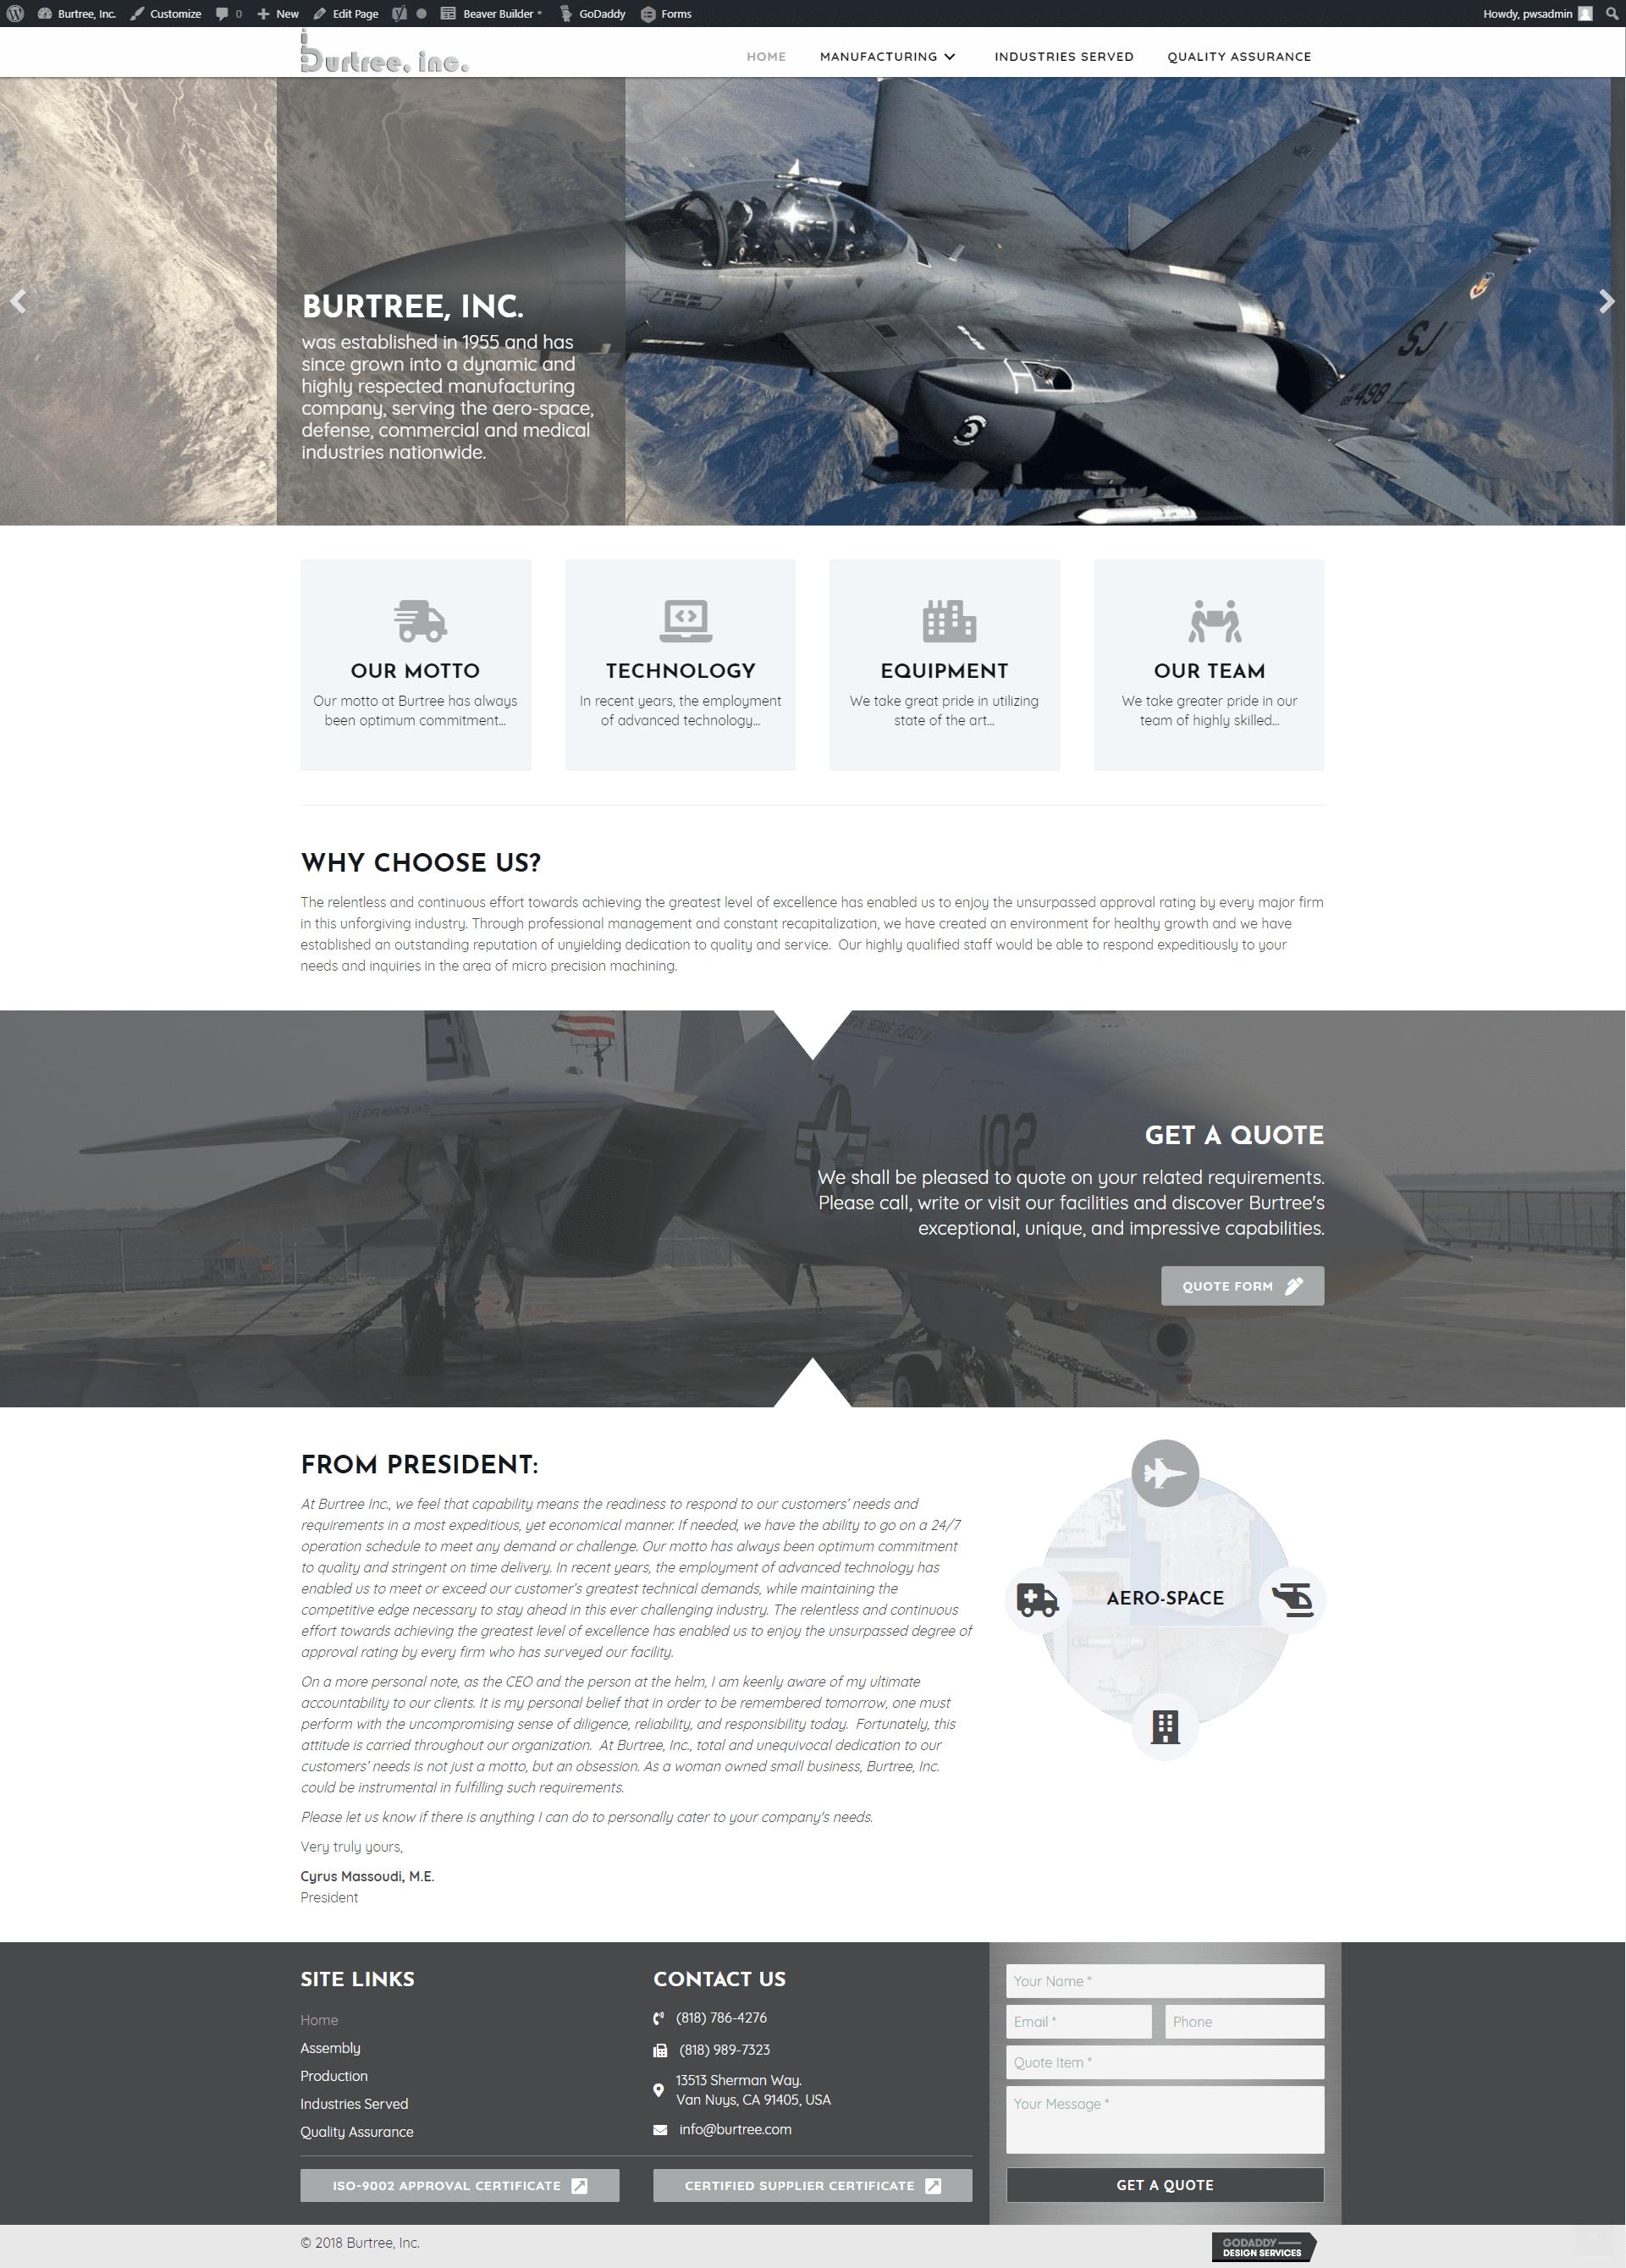 burtree - new site - wp